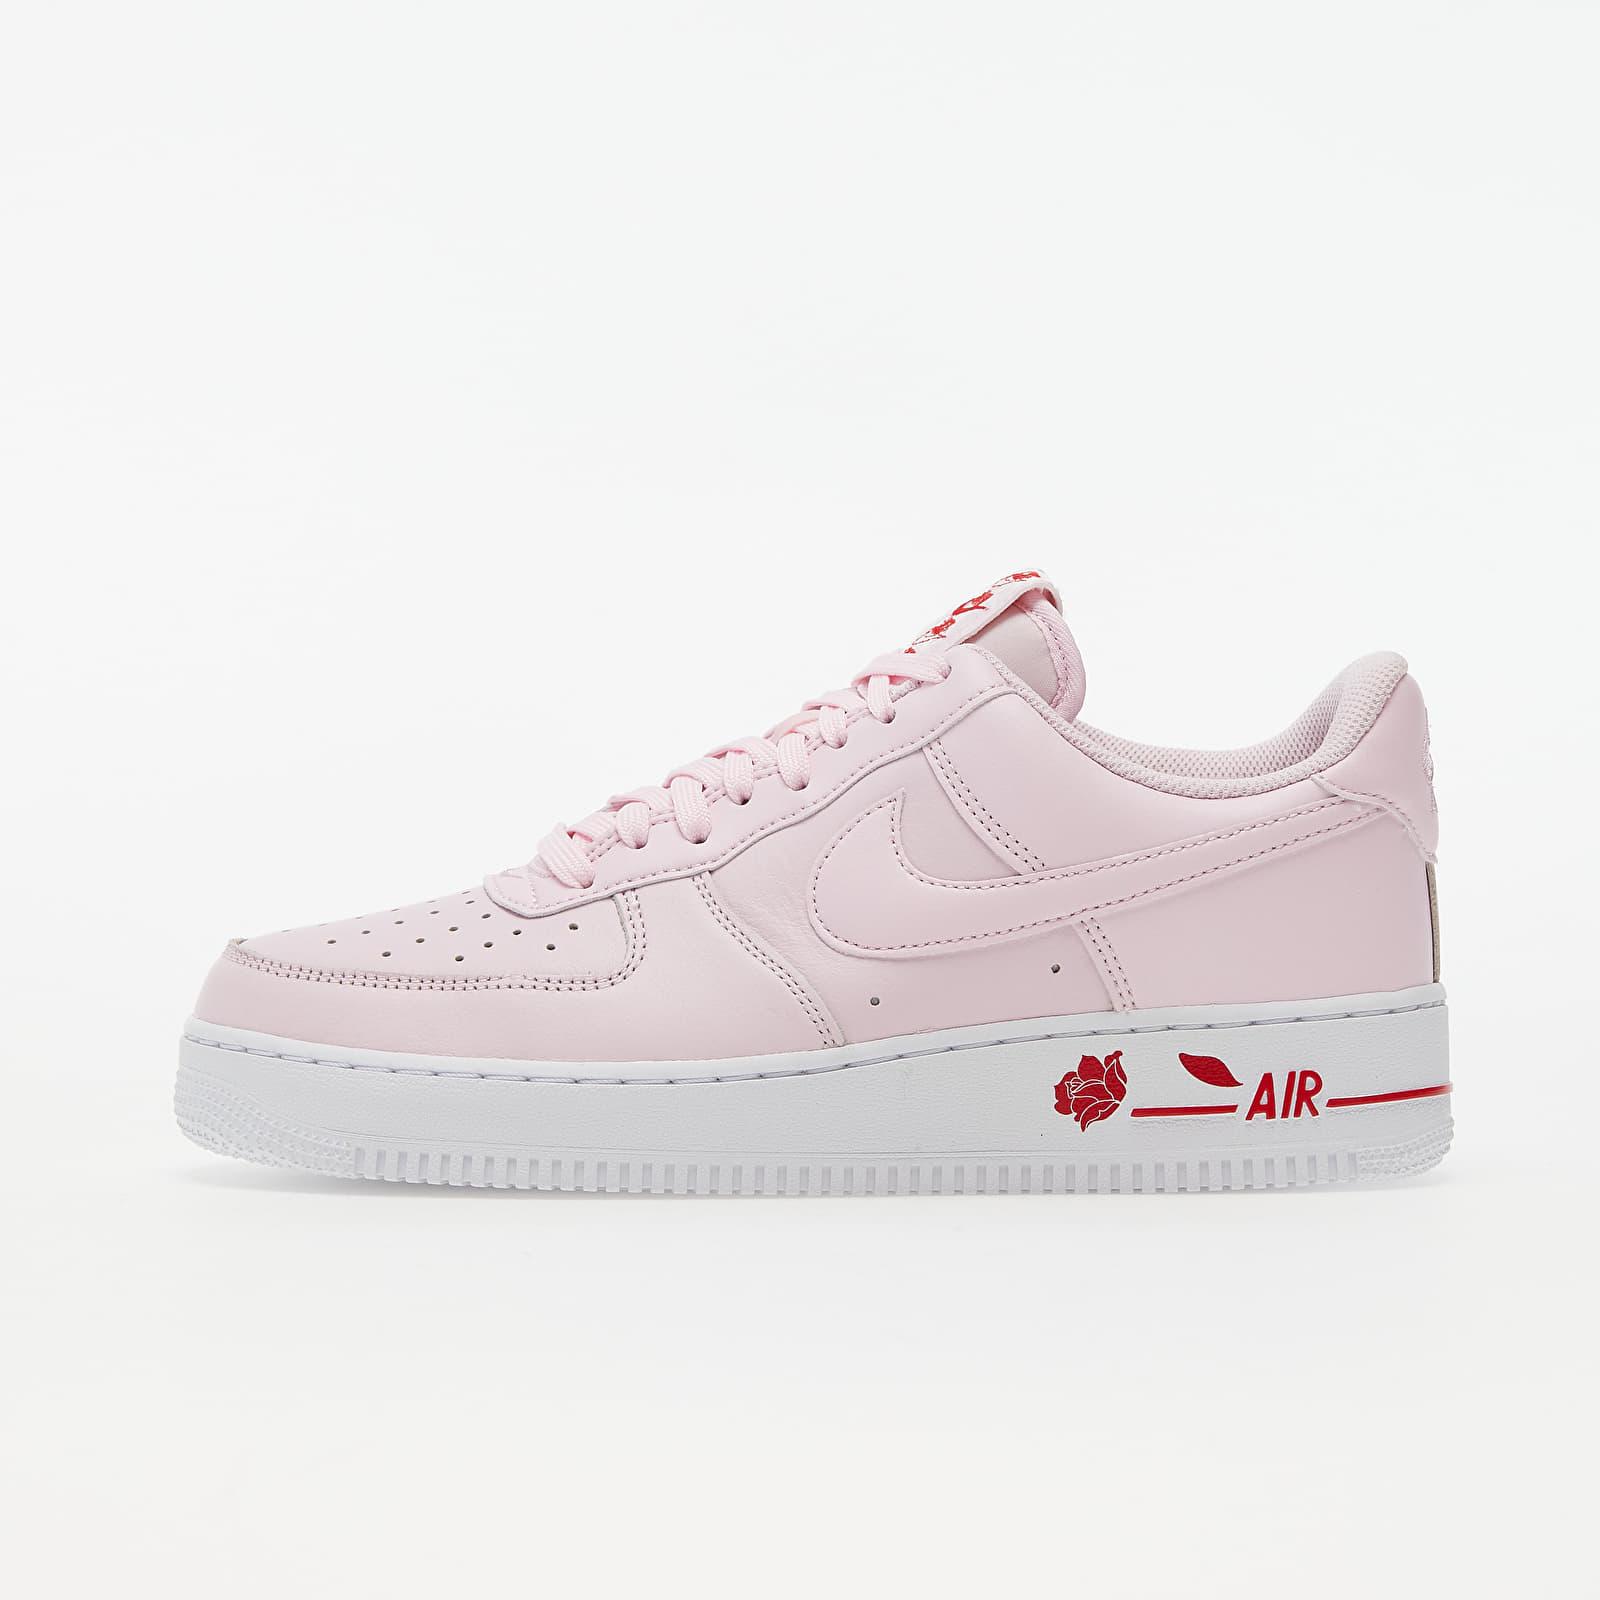 Nike Air Force 1 '07 LX Pink Foam / Pink Foam -University Red EUR 43